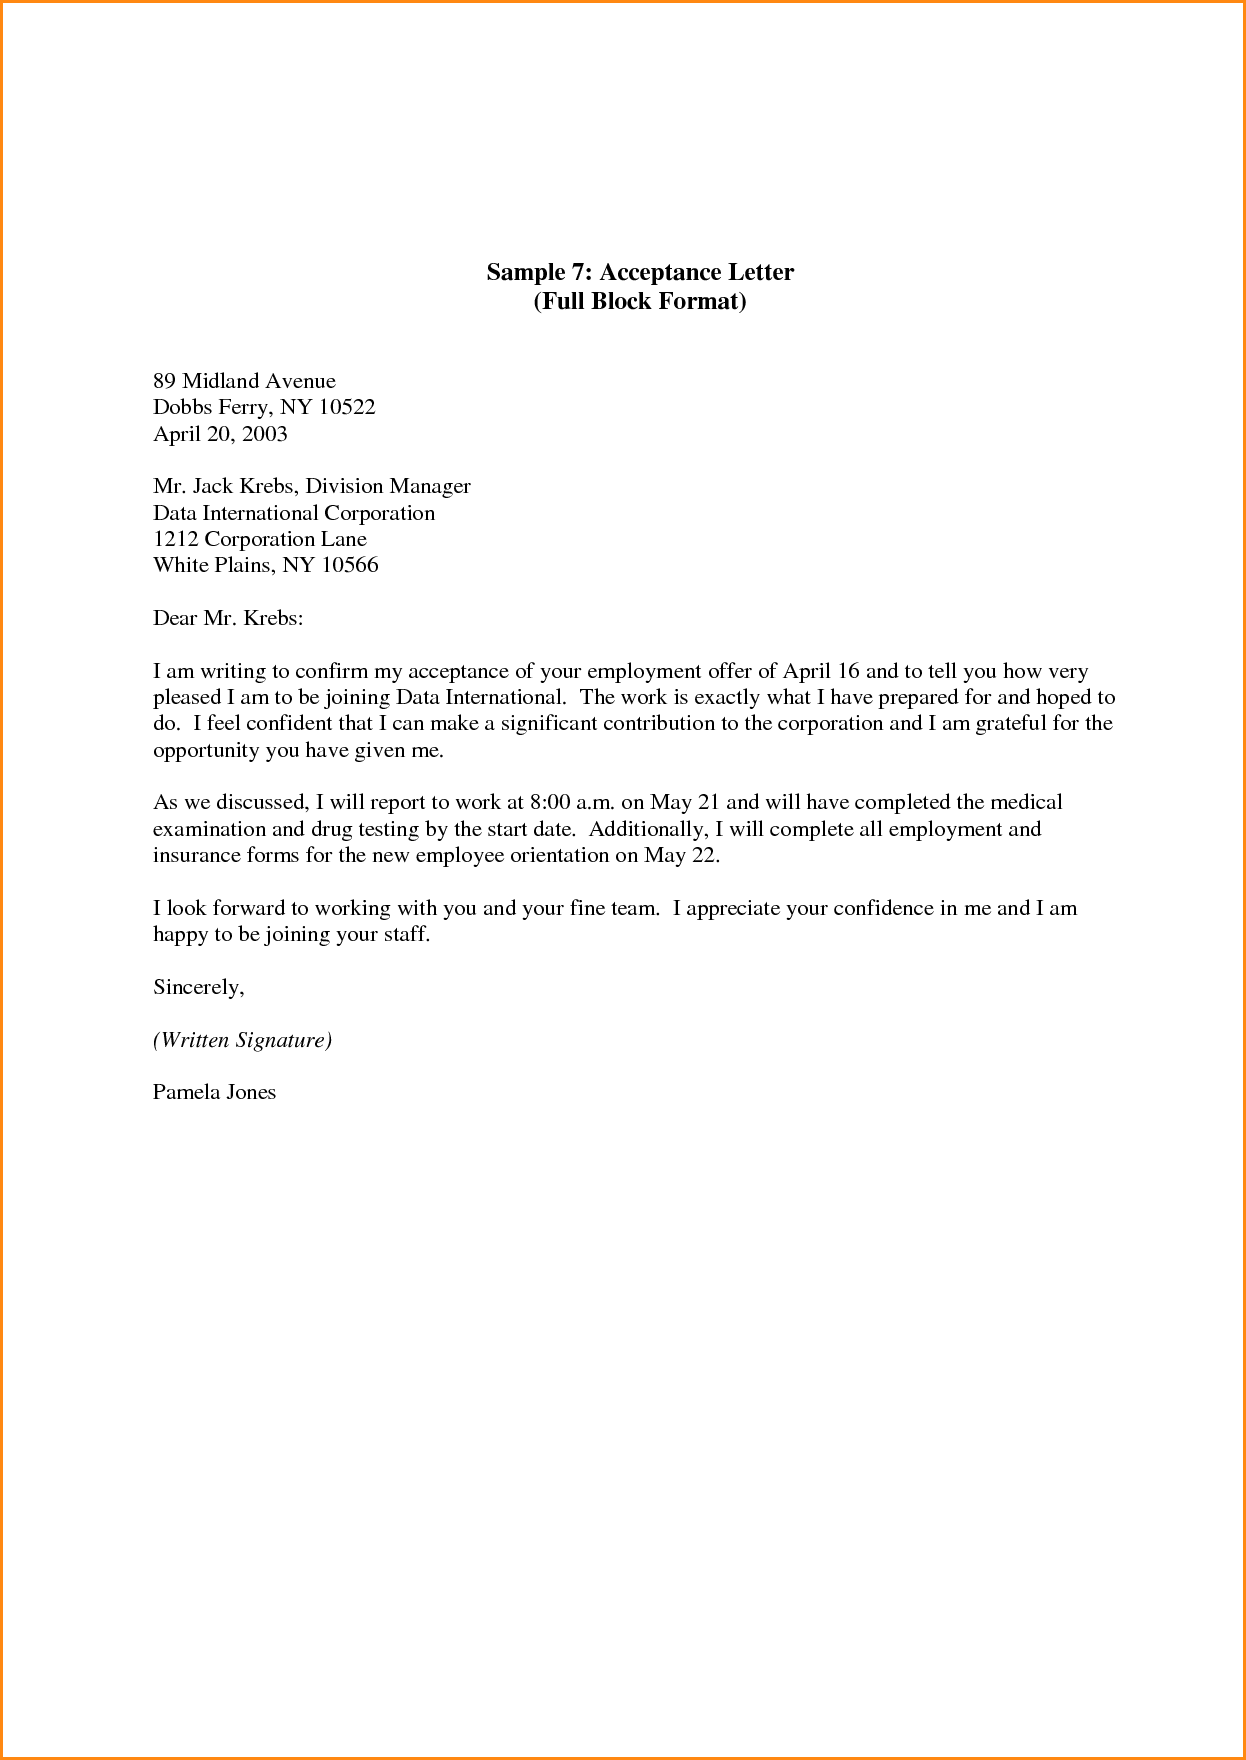 New Job Acceptance Letter Template Letter templates